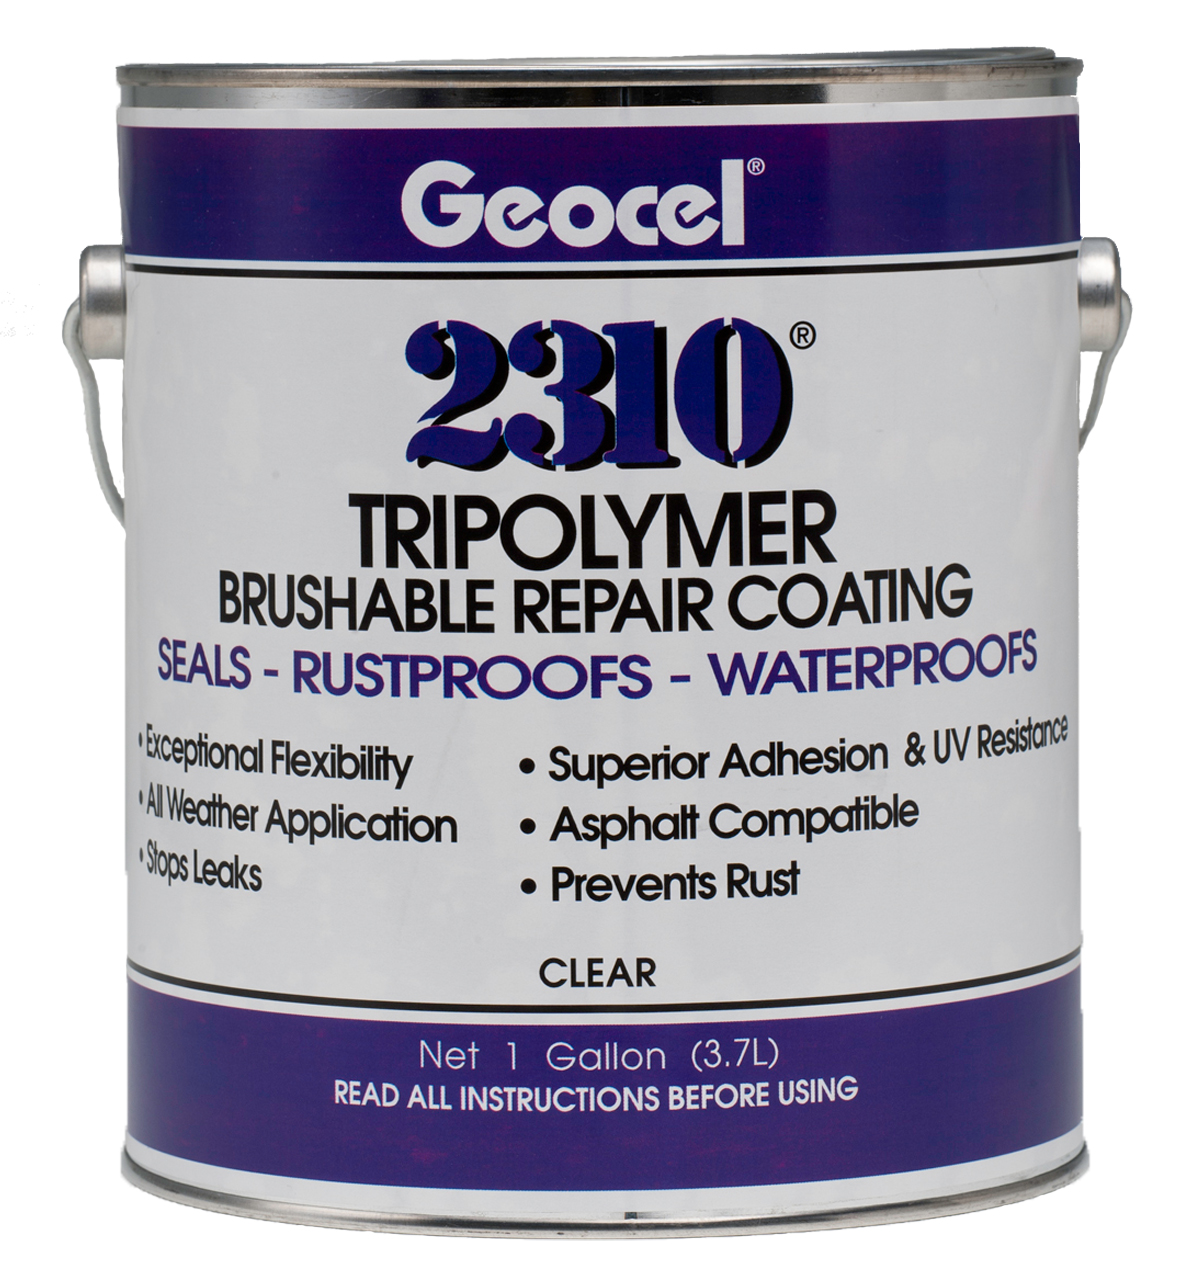 2310® TRIPOLYMER BRUSHABLE REPAIR COATING